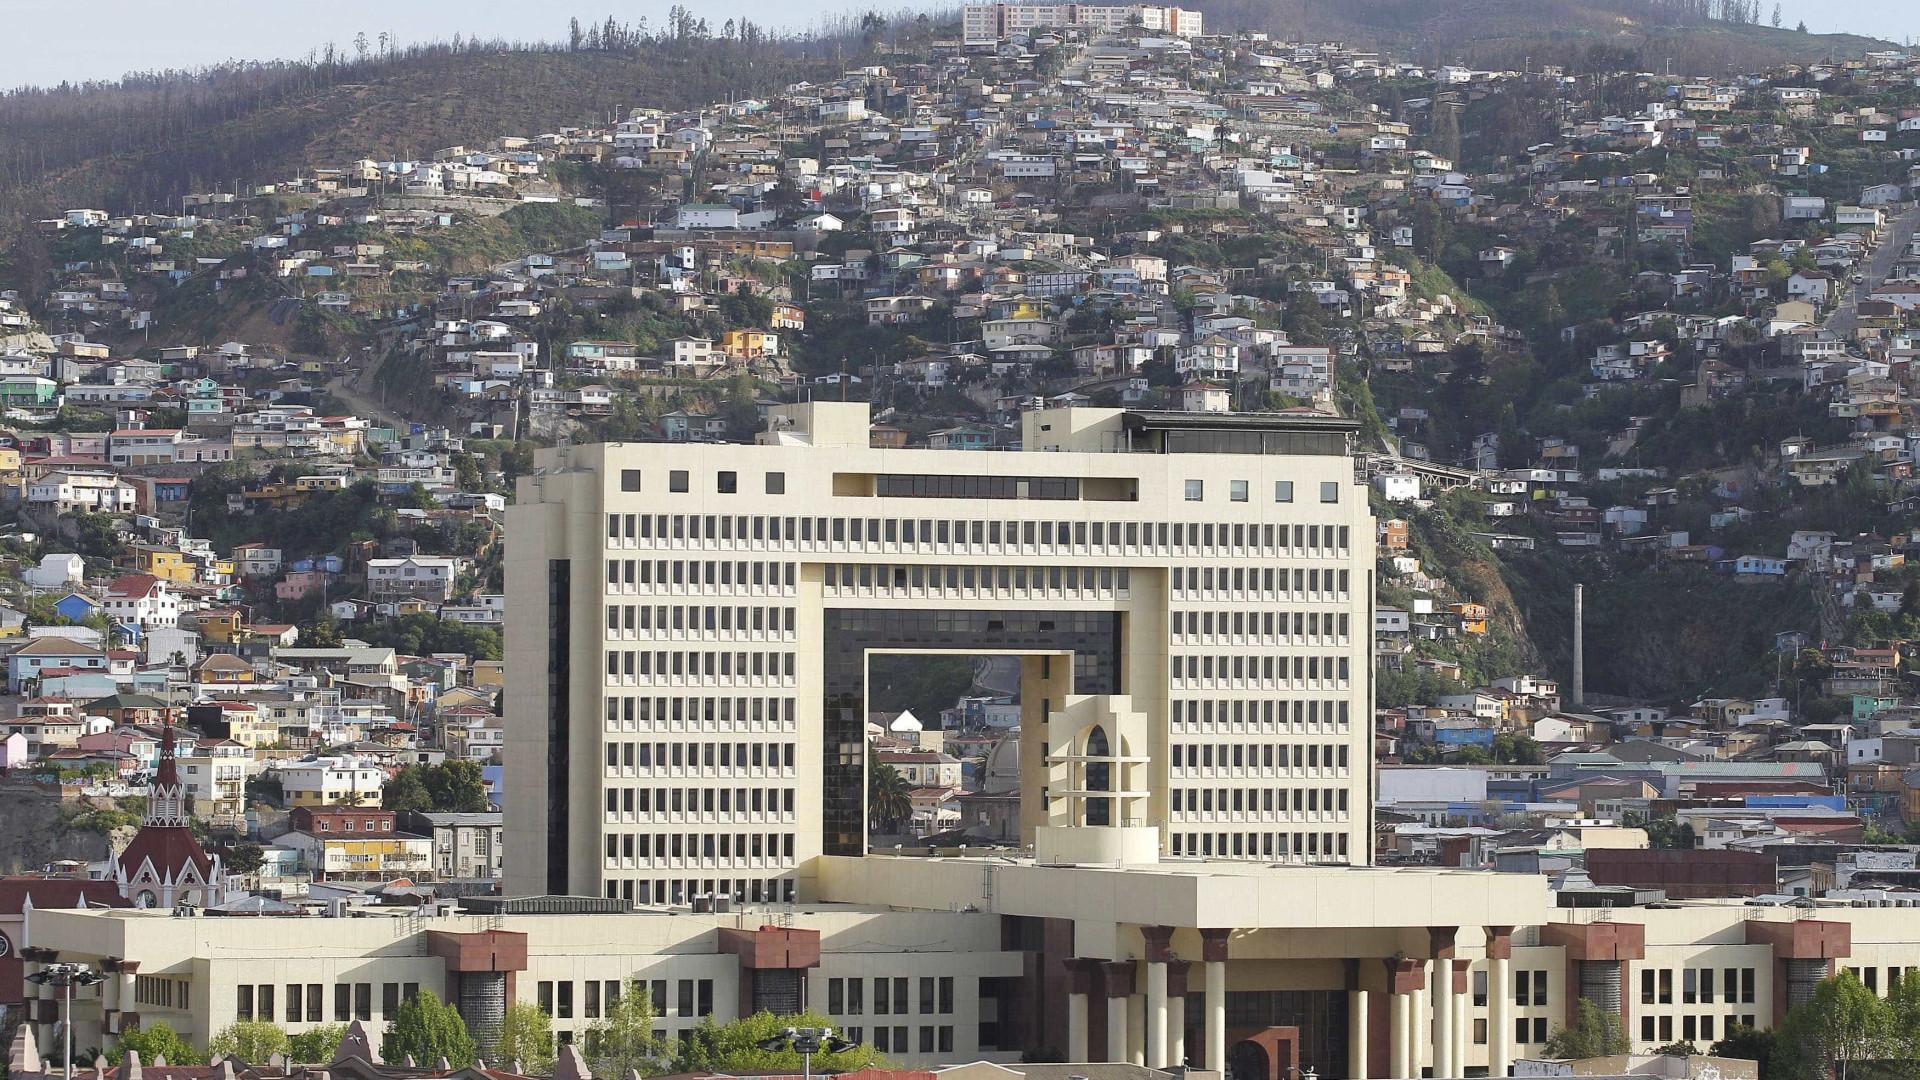 Terremoto de 7.1 graus atinge litoral do Chile